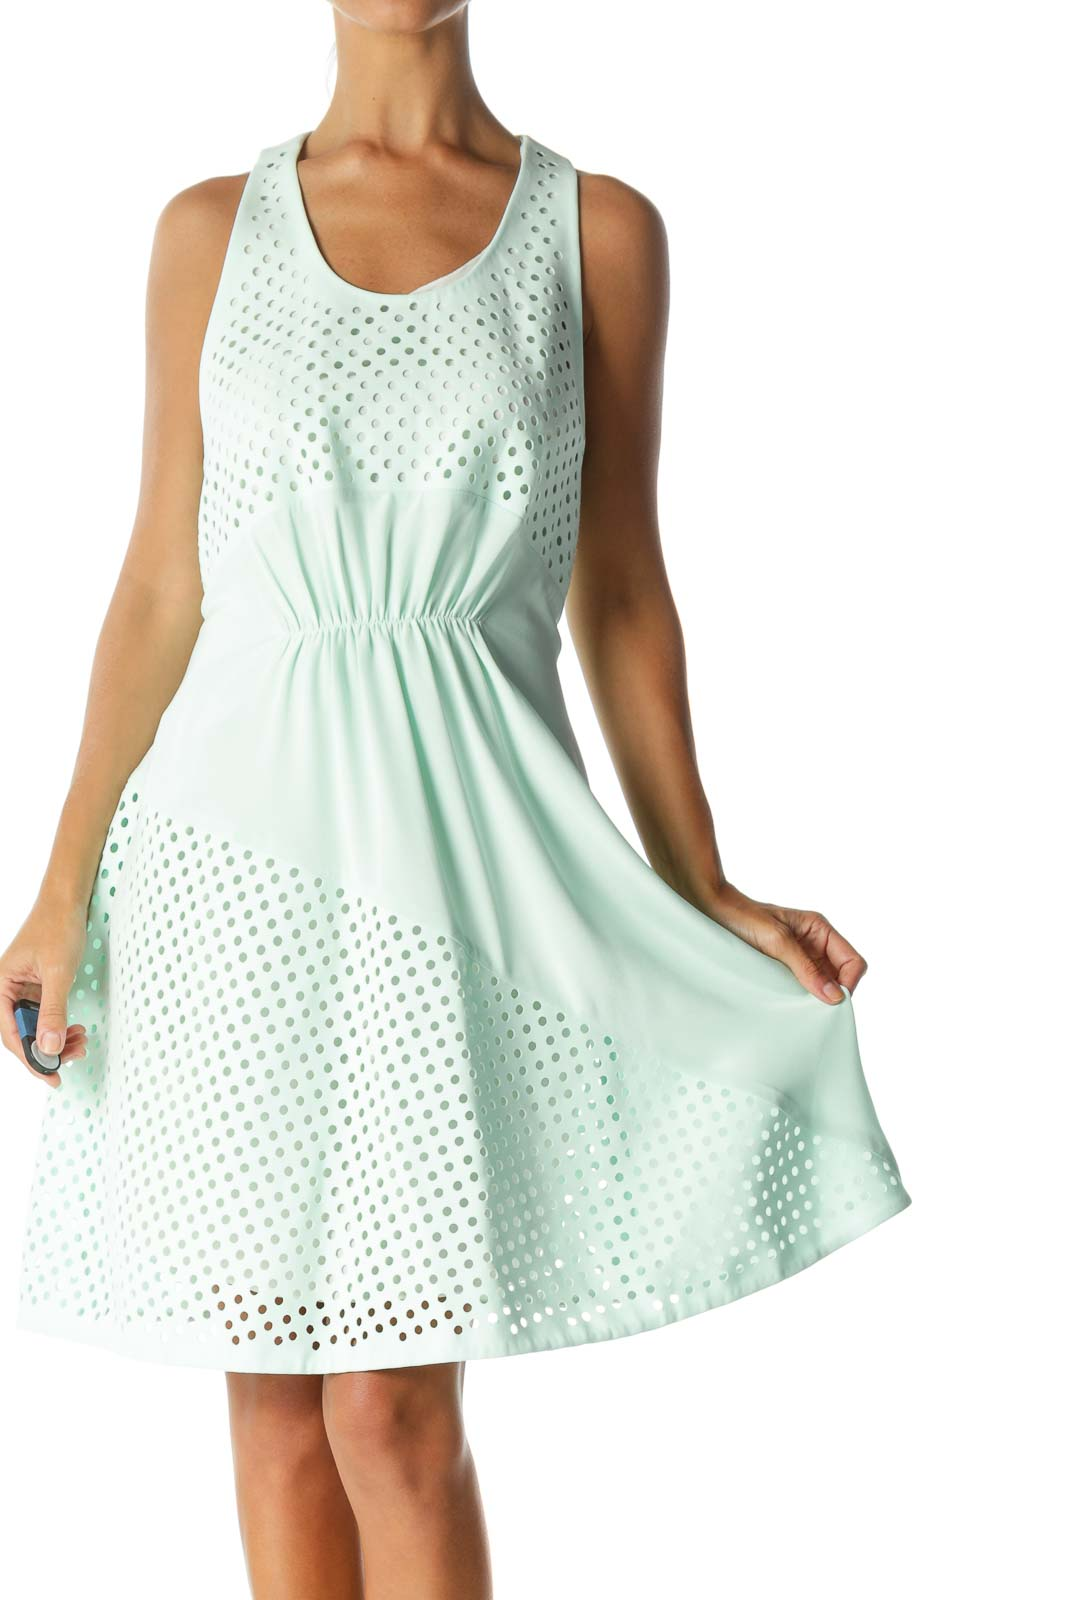 Mint Green Designer 100% Silk Circle-Cut-Out Sleeveless Day-Dress Front